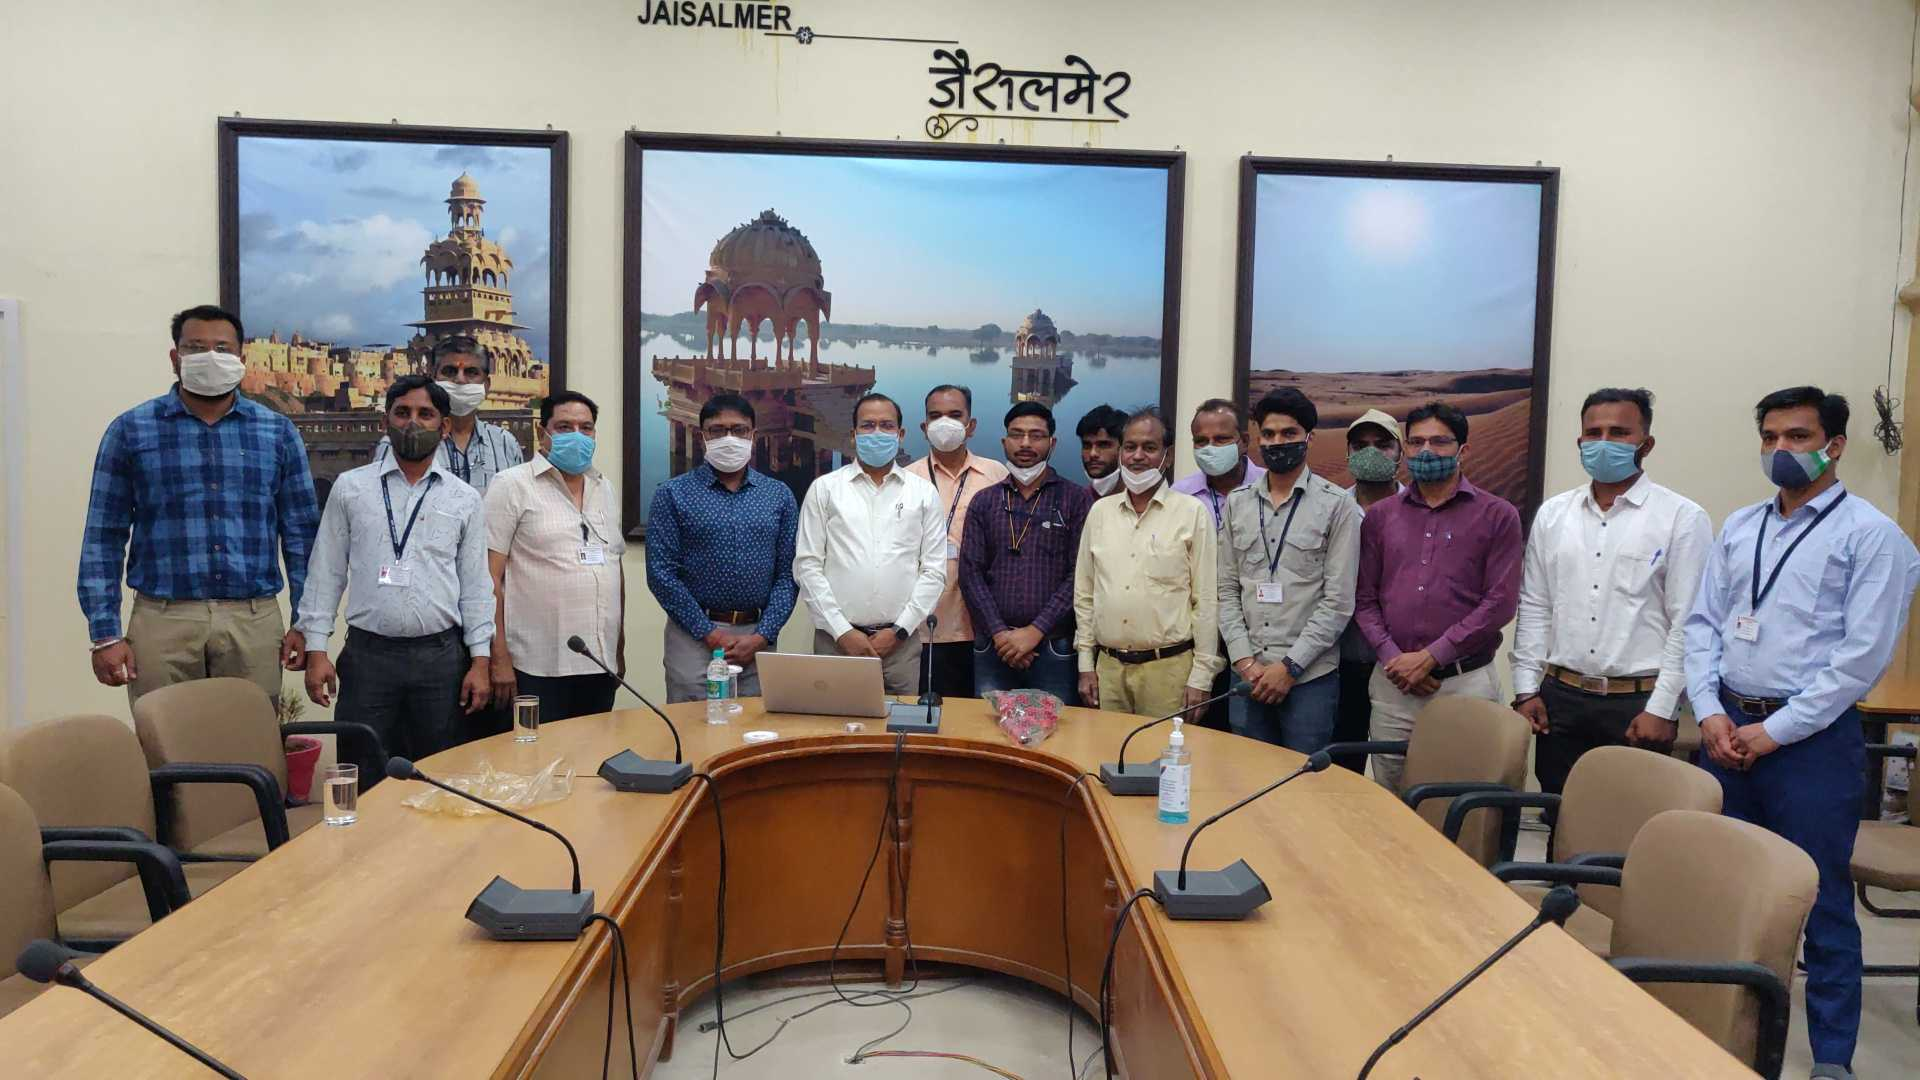 Jaisalmer Collector asish modi group photo